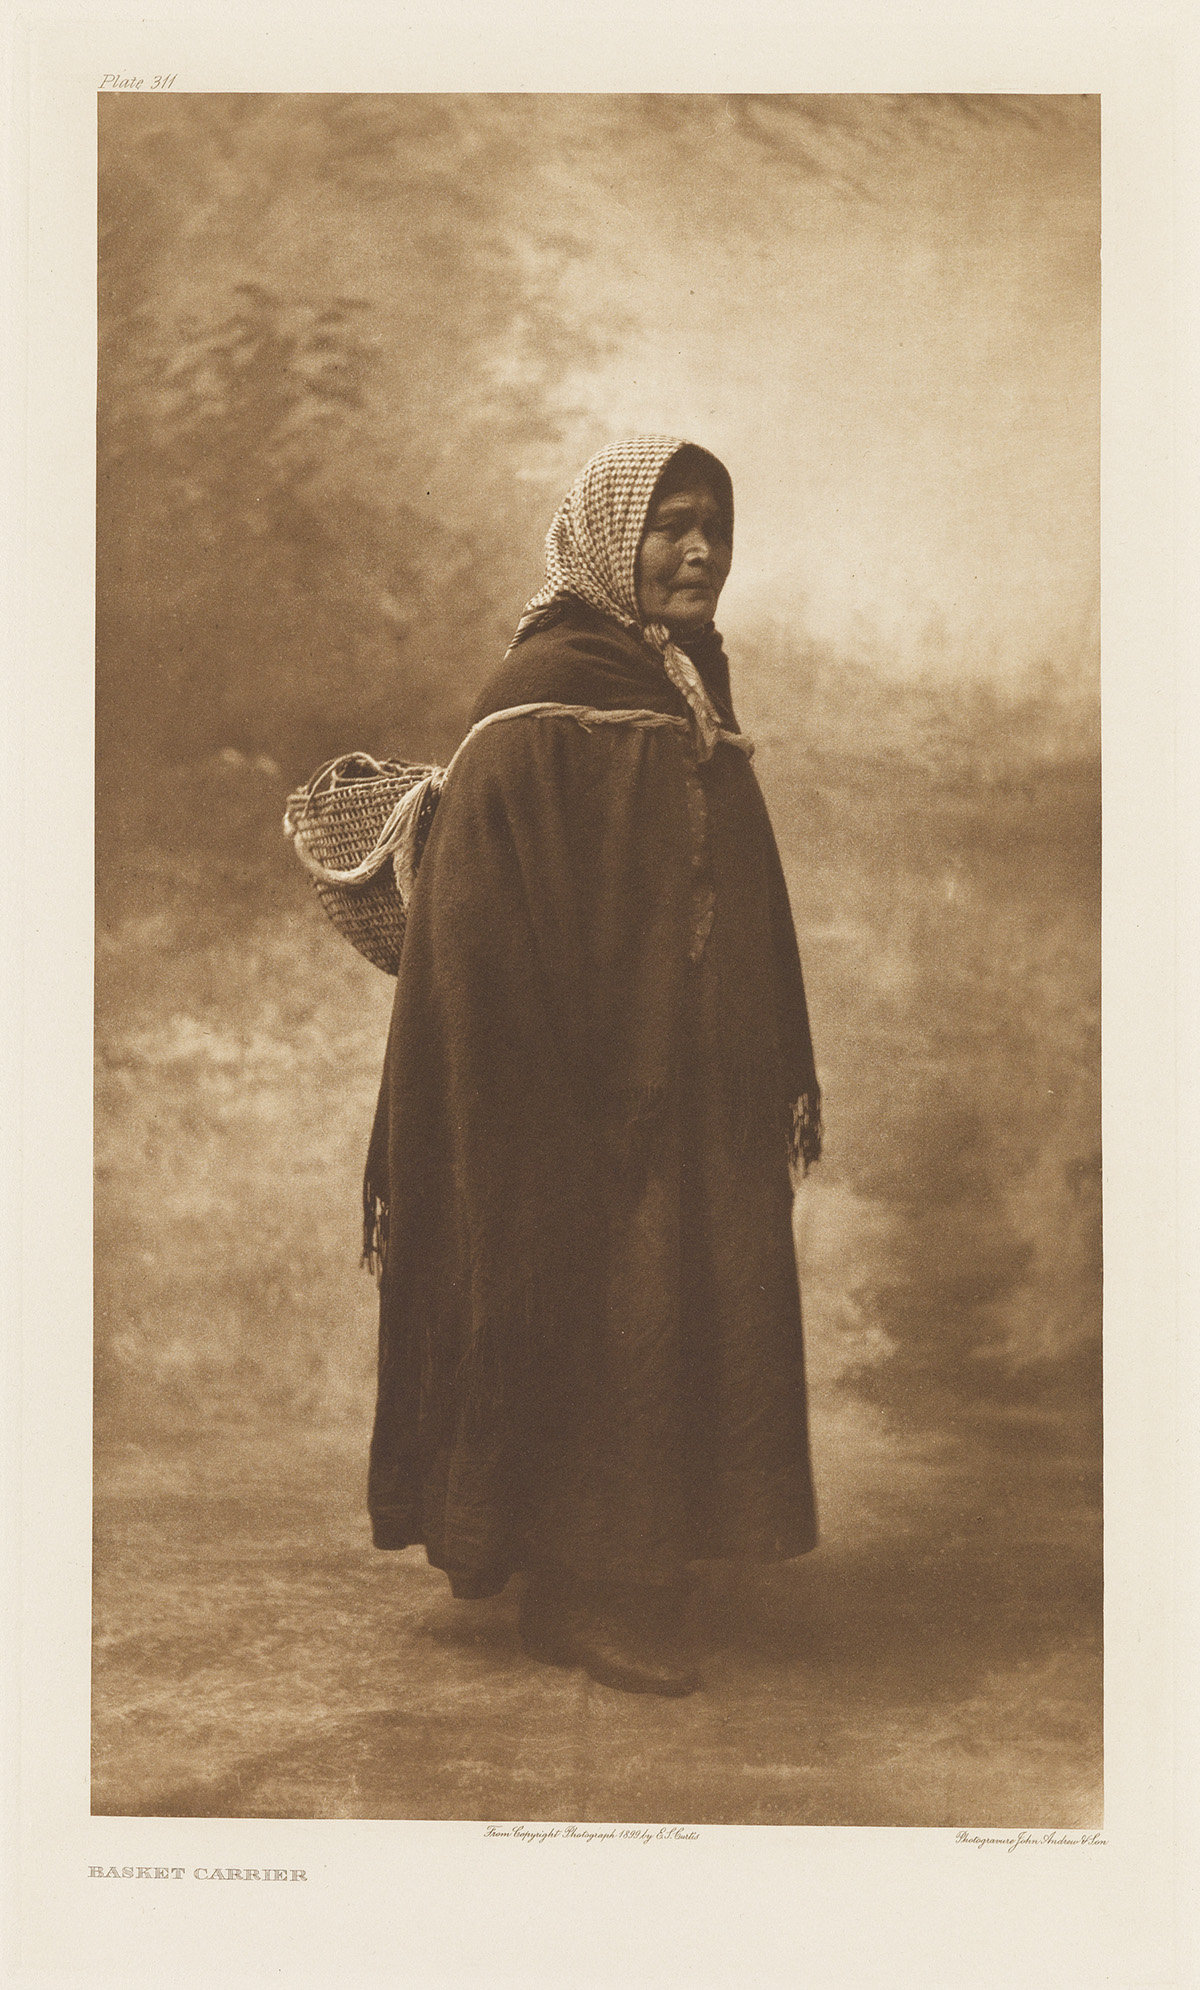 EDWARD S. CURTIS (1868-1952) The North American Indian, Portfolio IX [Puget Sound].